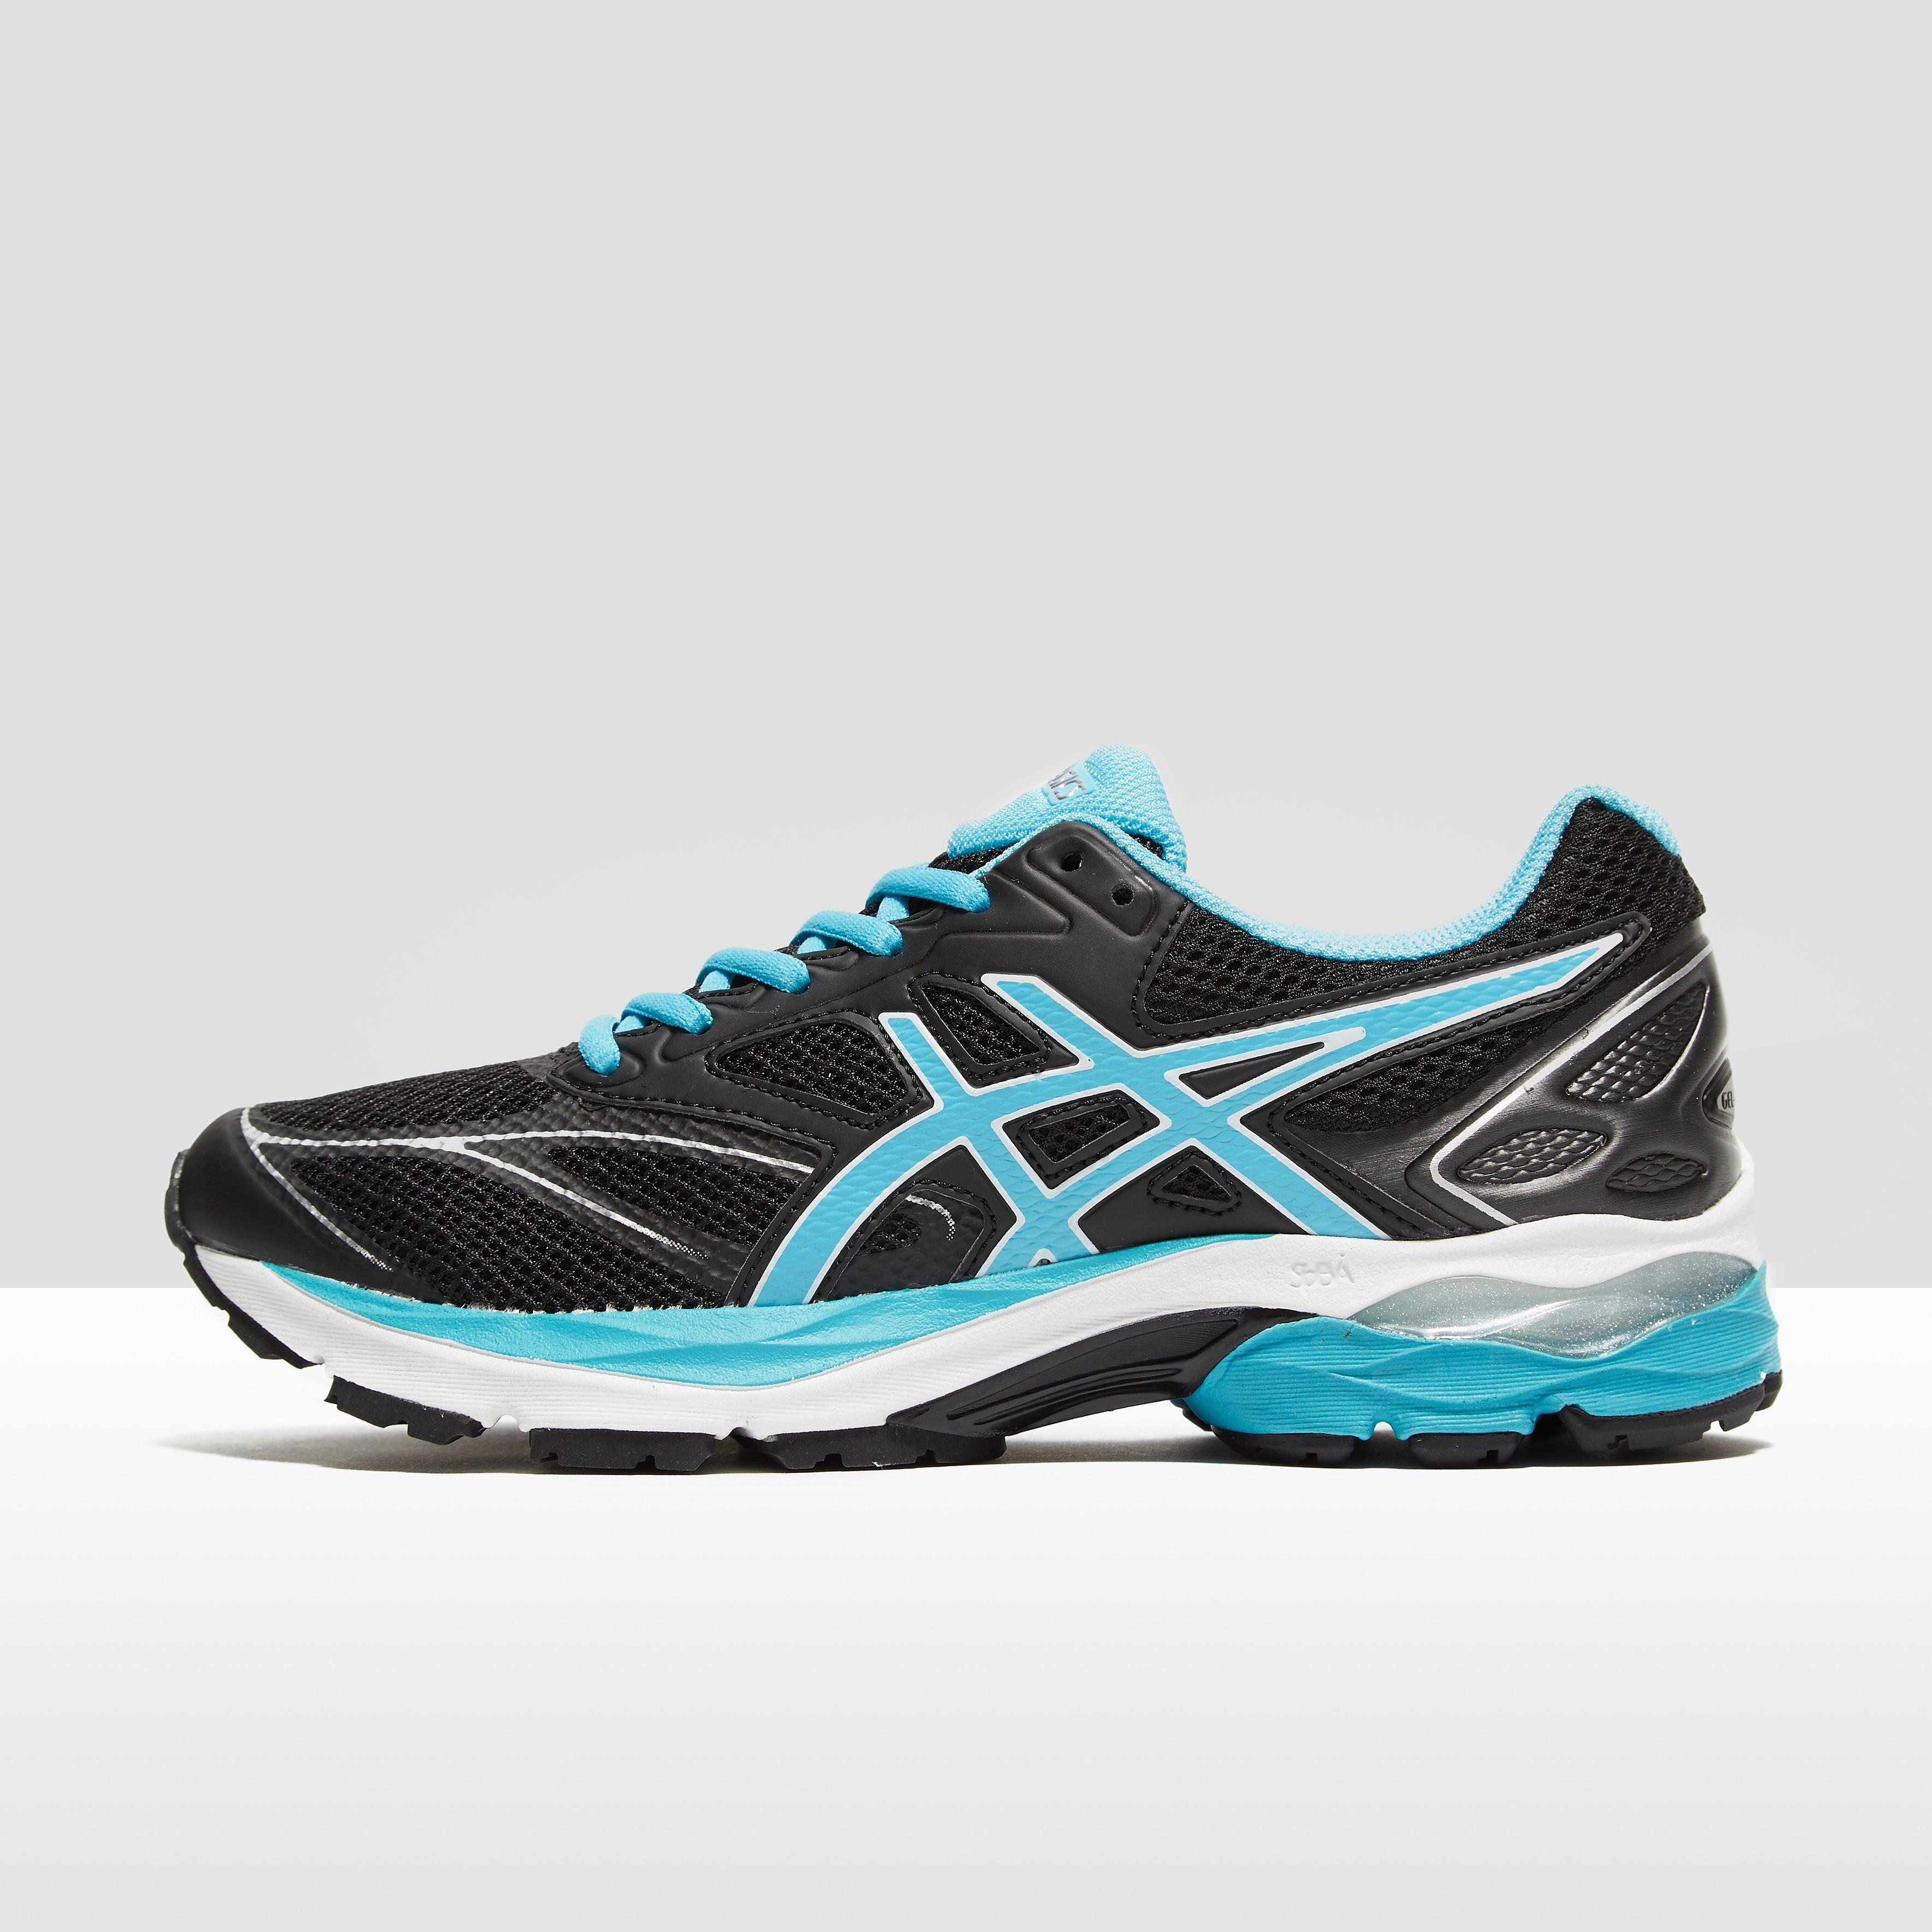 ASICS GEL Pulse 3 Women's Running Shoes